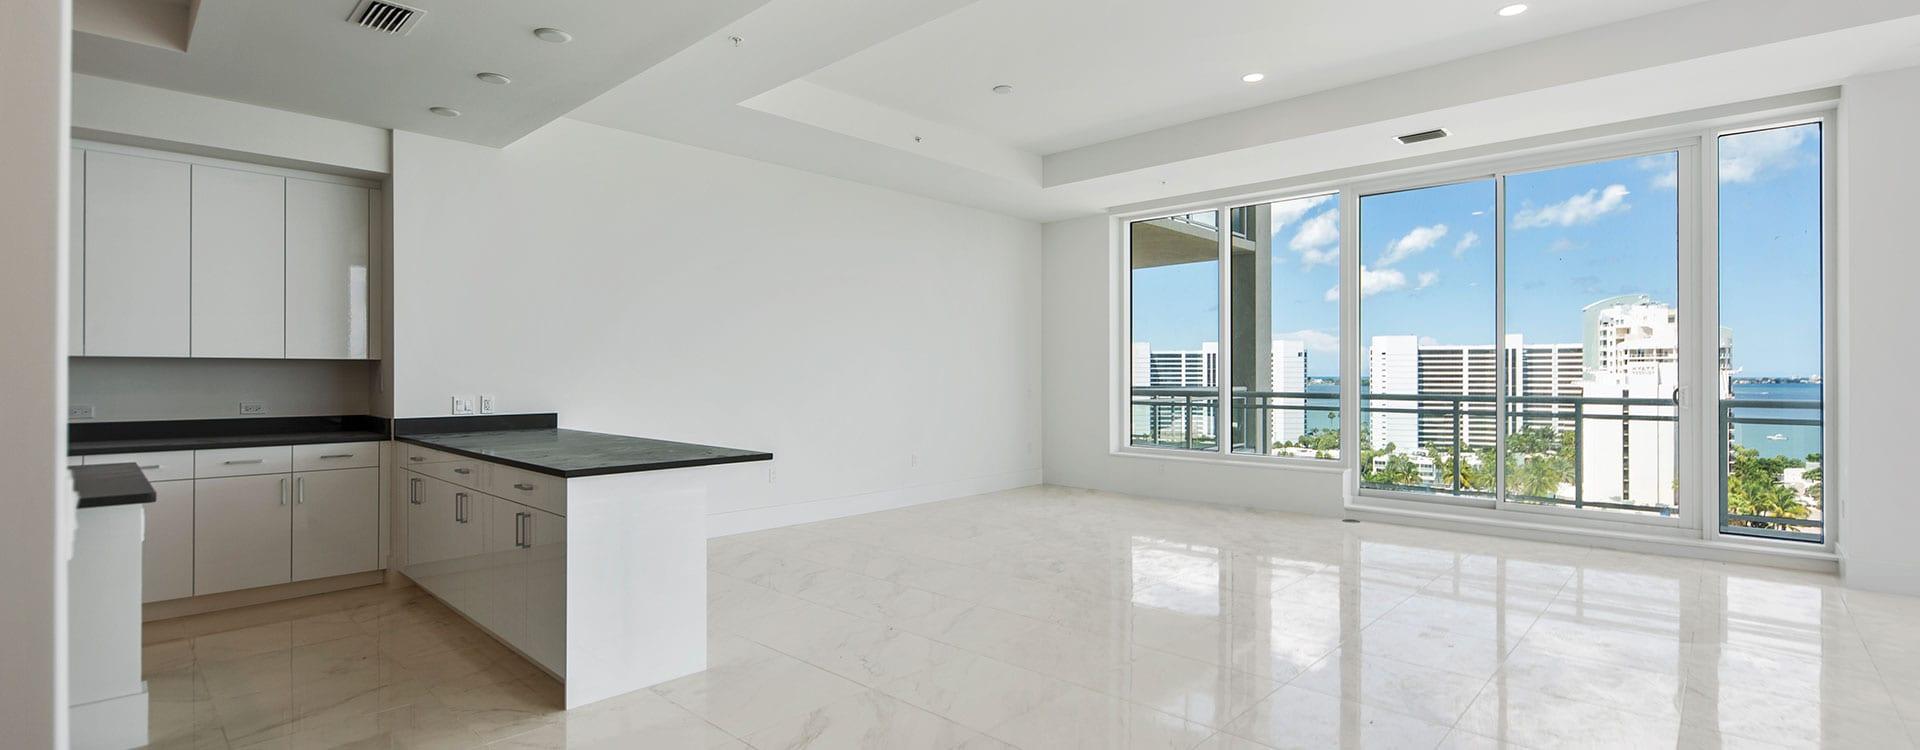 BLVD Sarasota Residence 1102 Great Room with view of sarasota bayfront